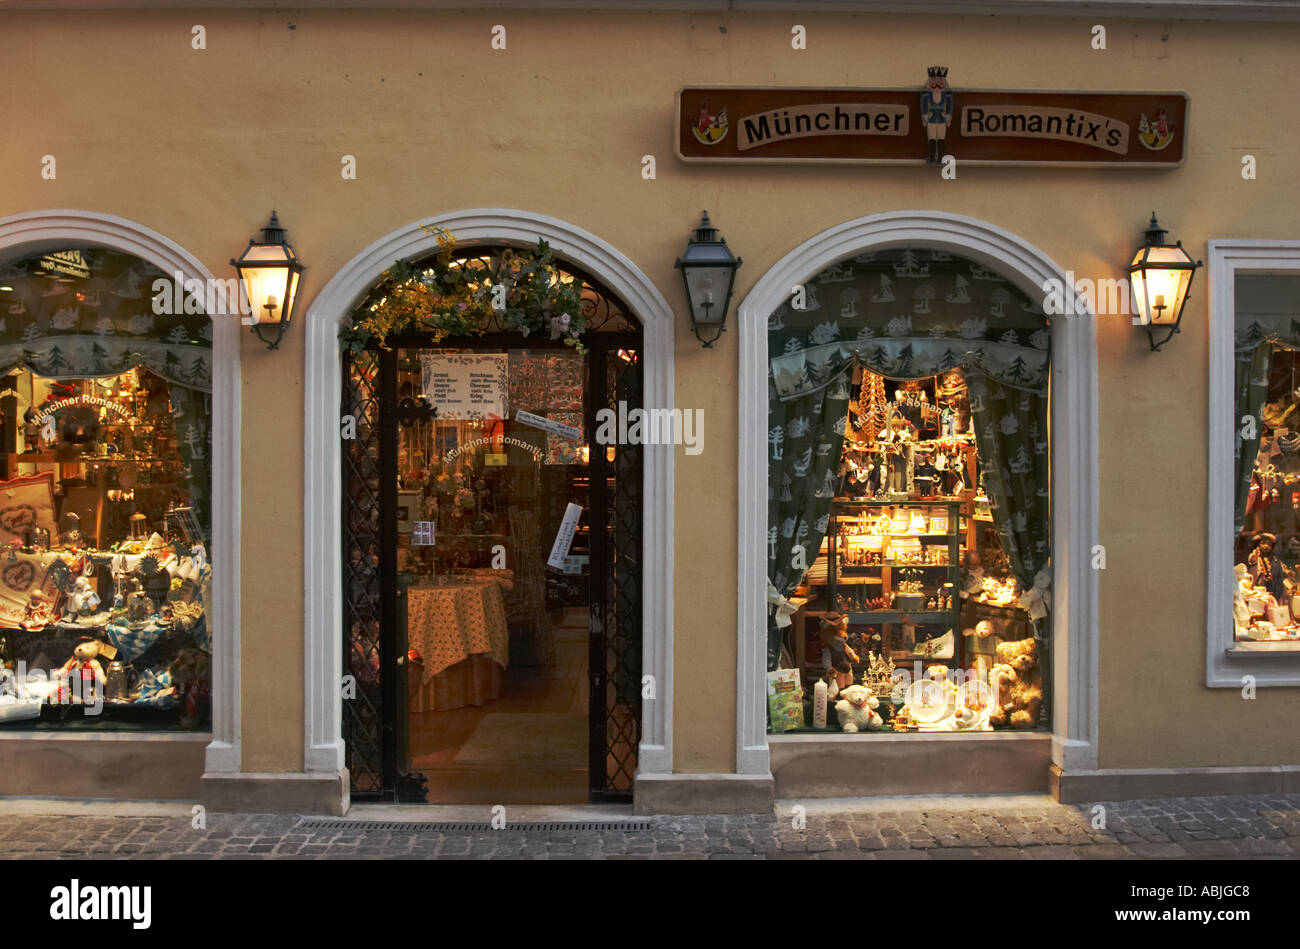 Windows of a souvenir shop near Platzl square in Munich. Germany. - Stock  Image